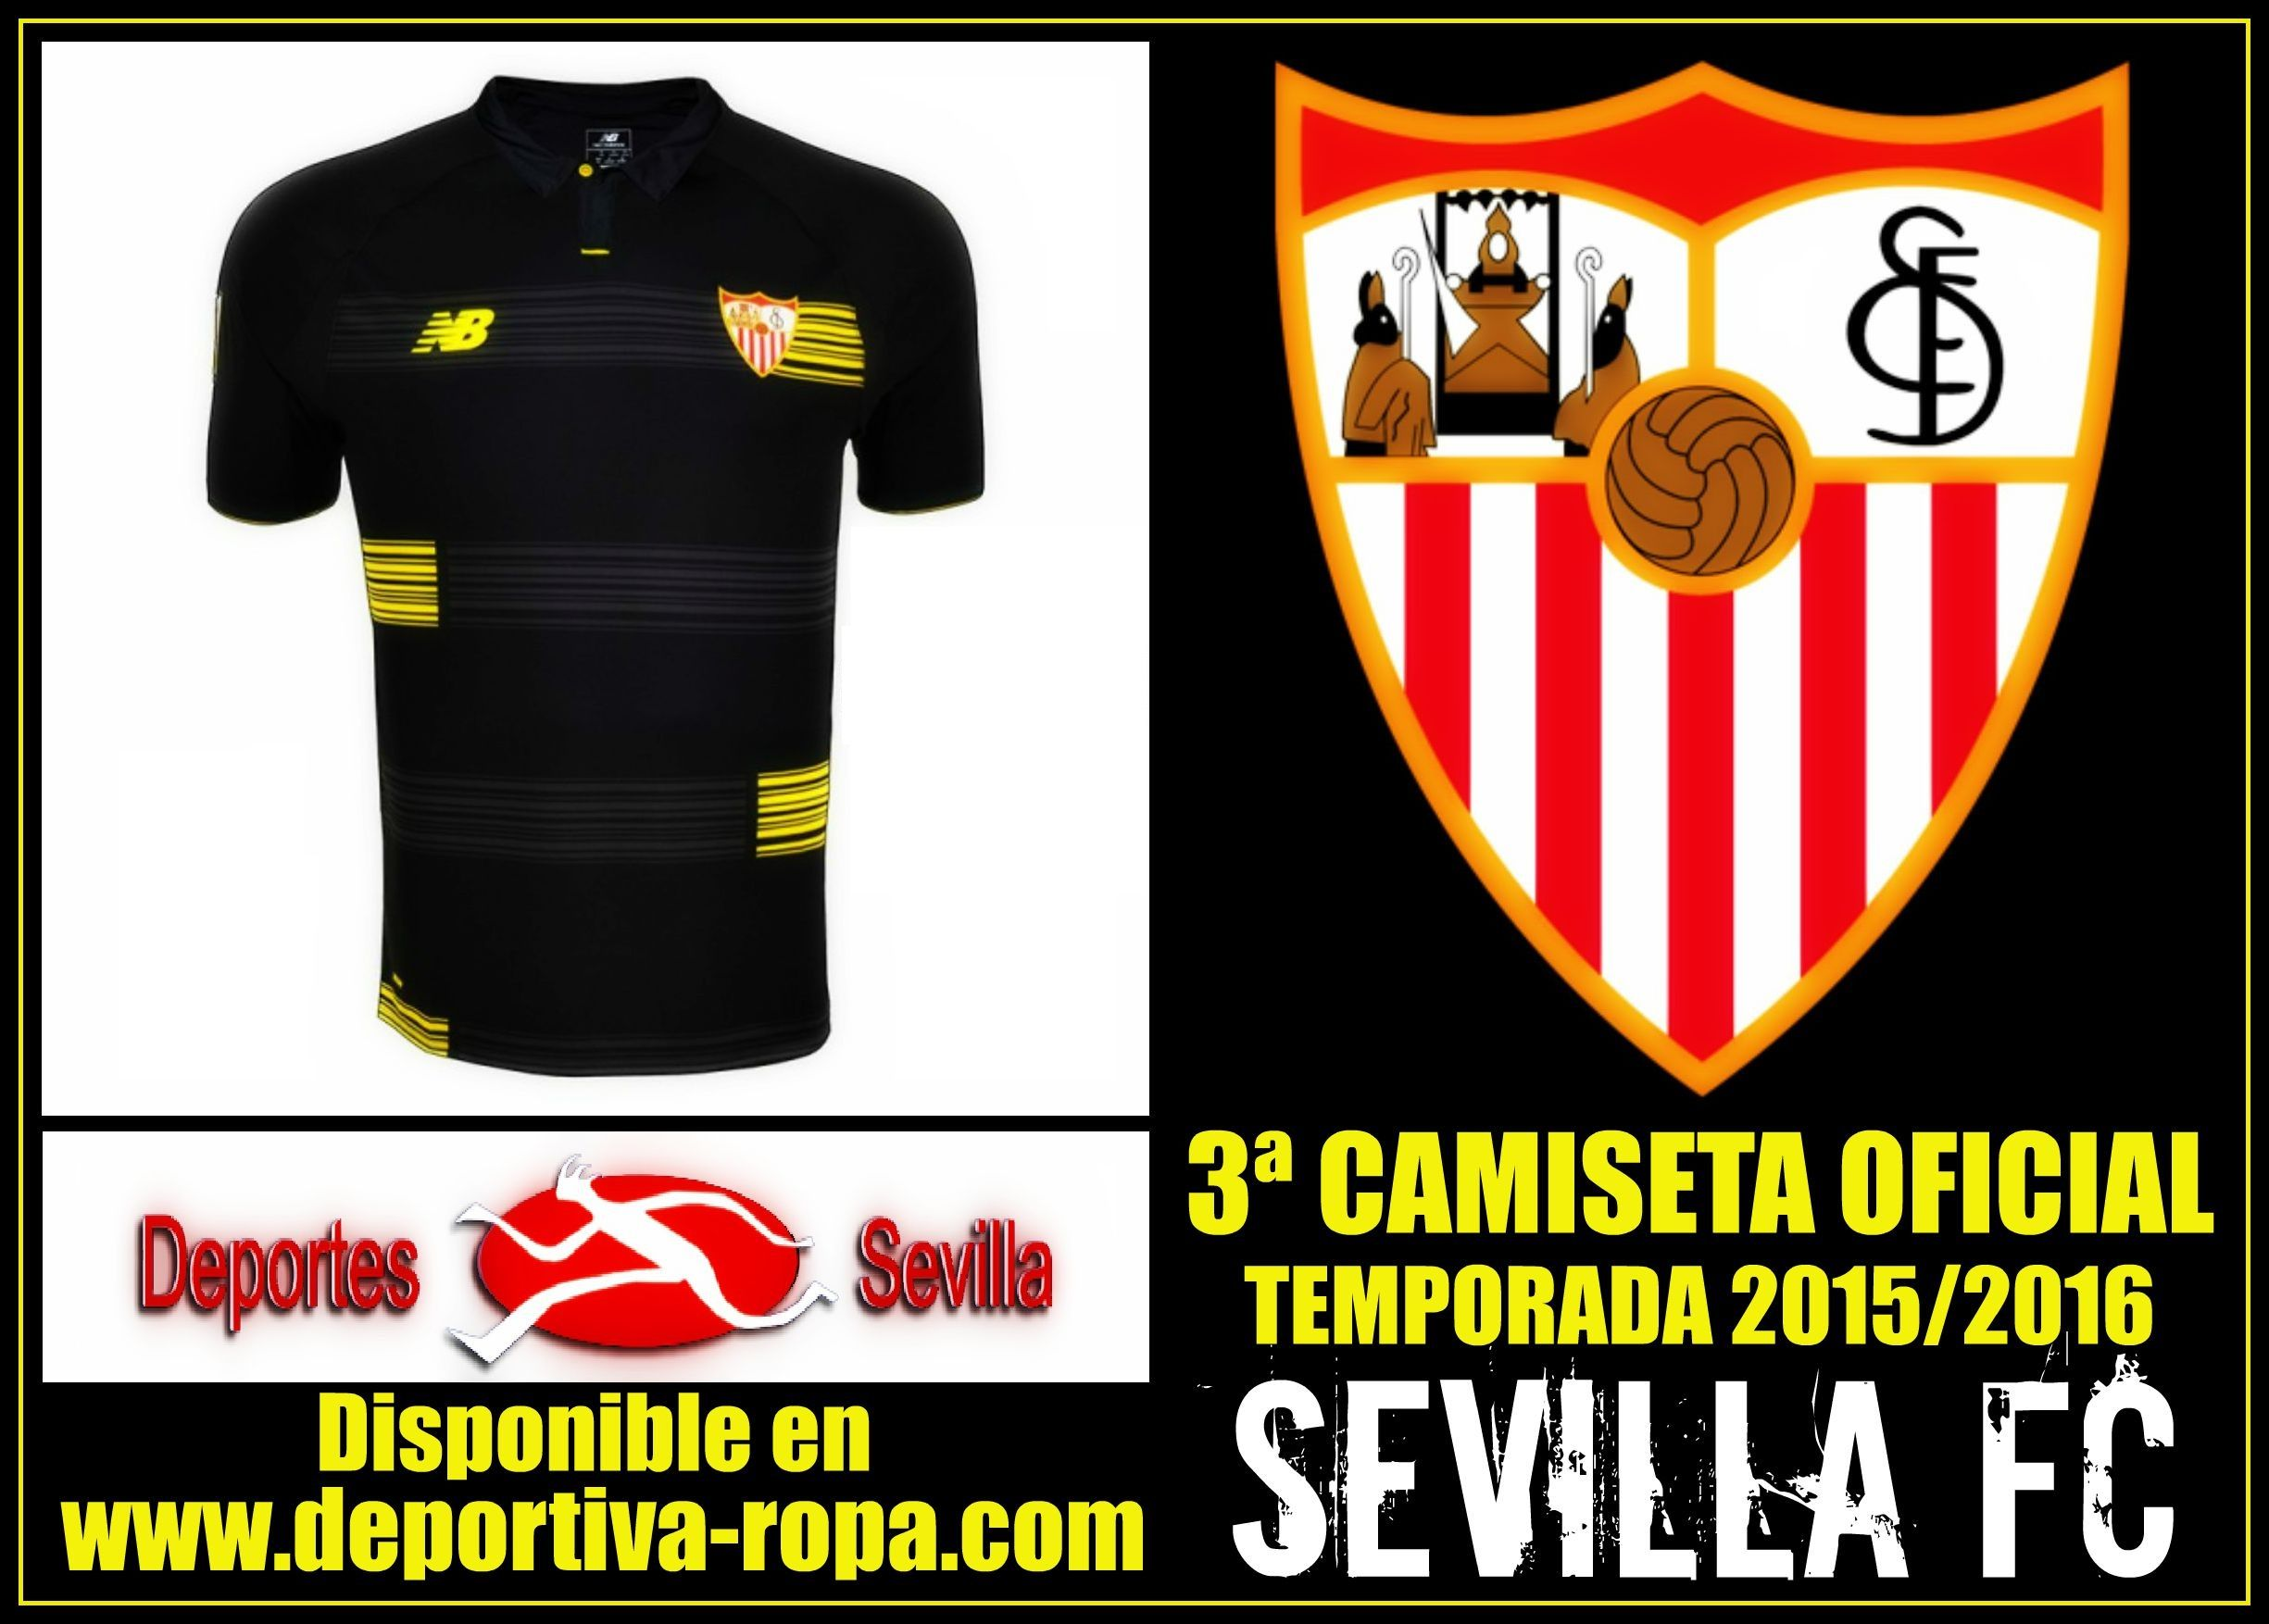 Camiseta Sevilla FC deportivas